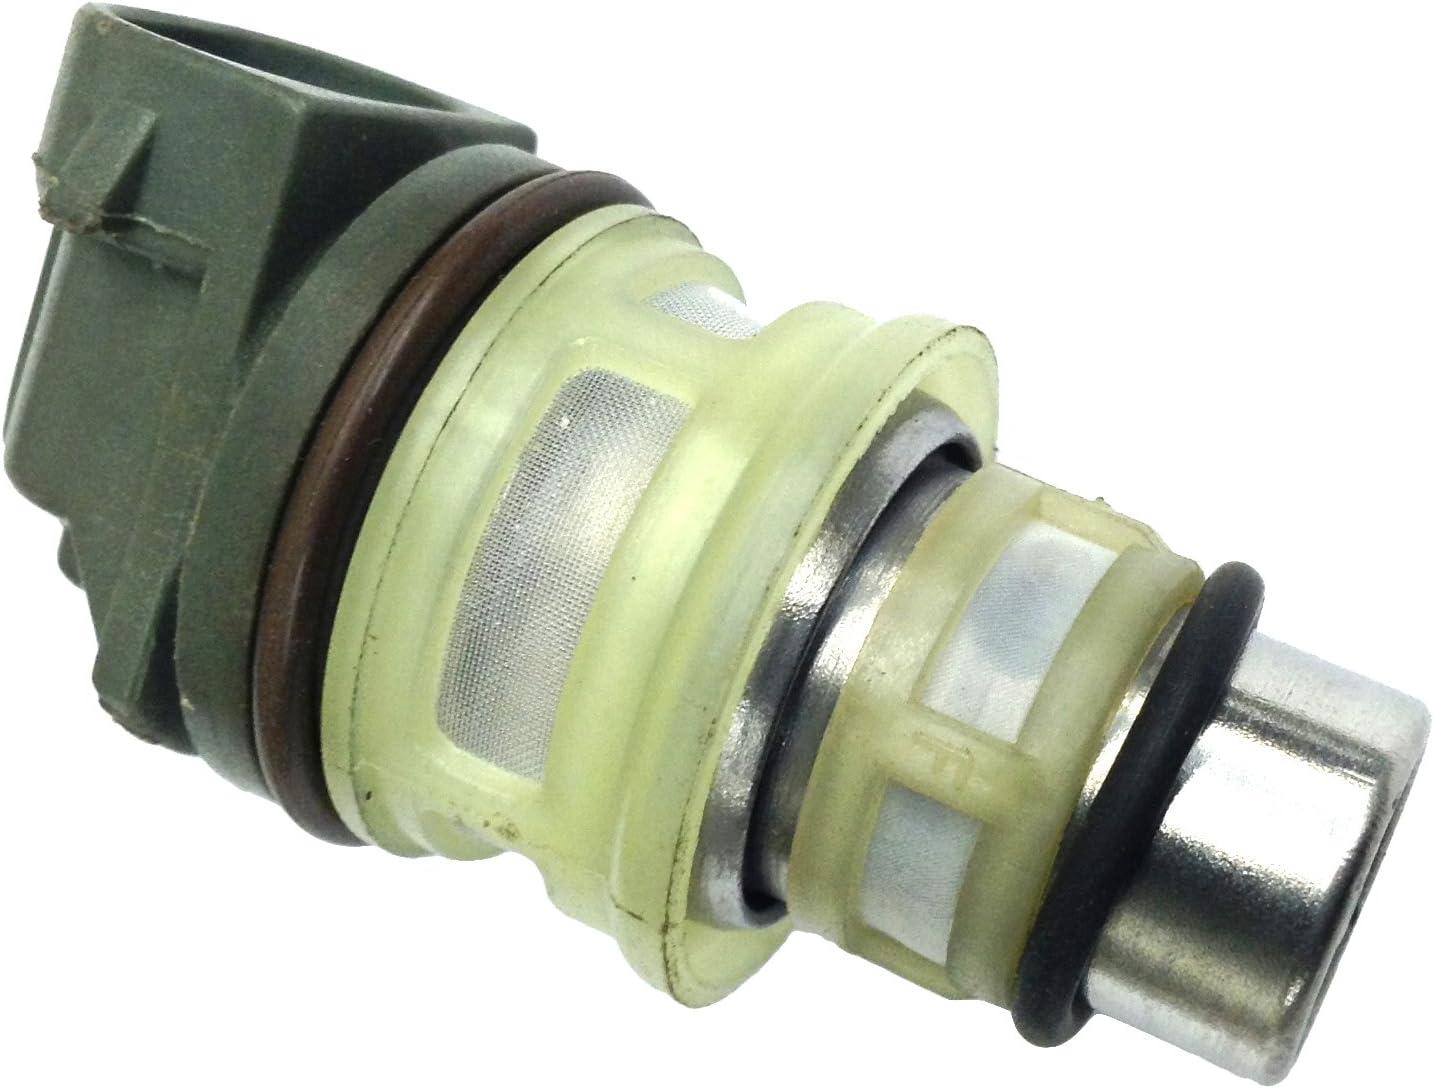 Replacement Parts UREMCO 21078 Remanufactured Fuel Injector Fuel ...